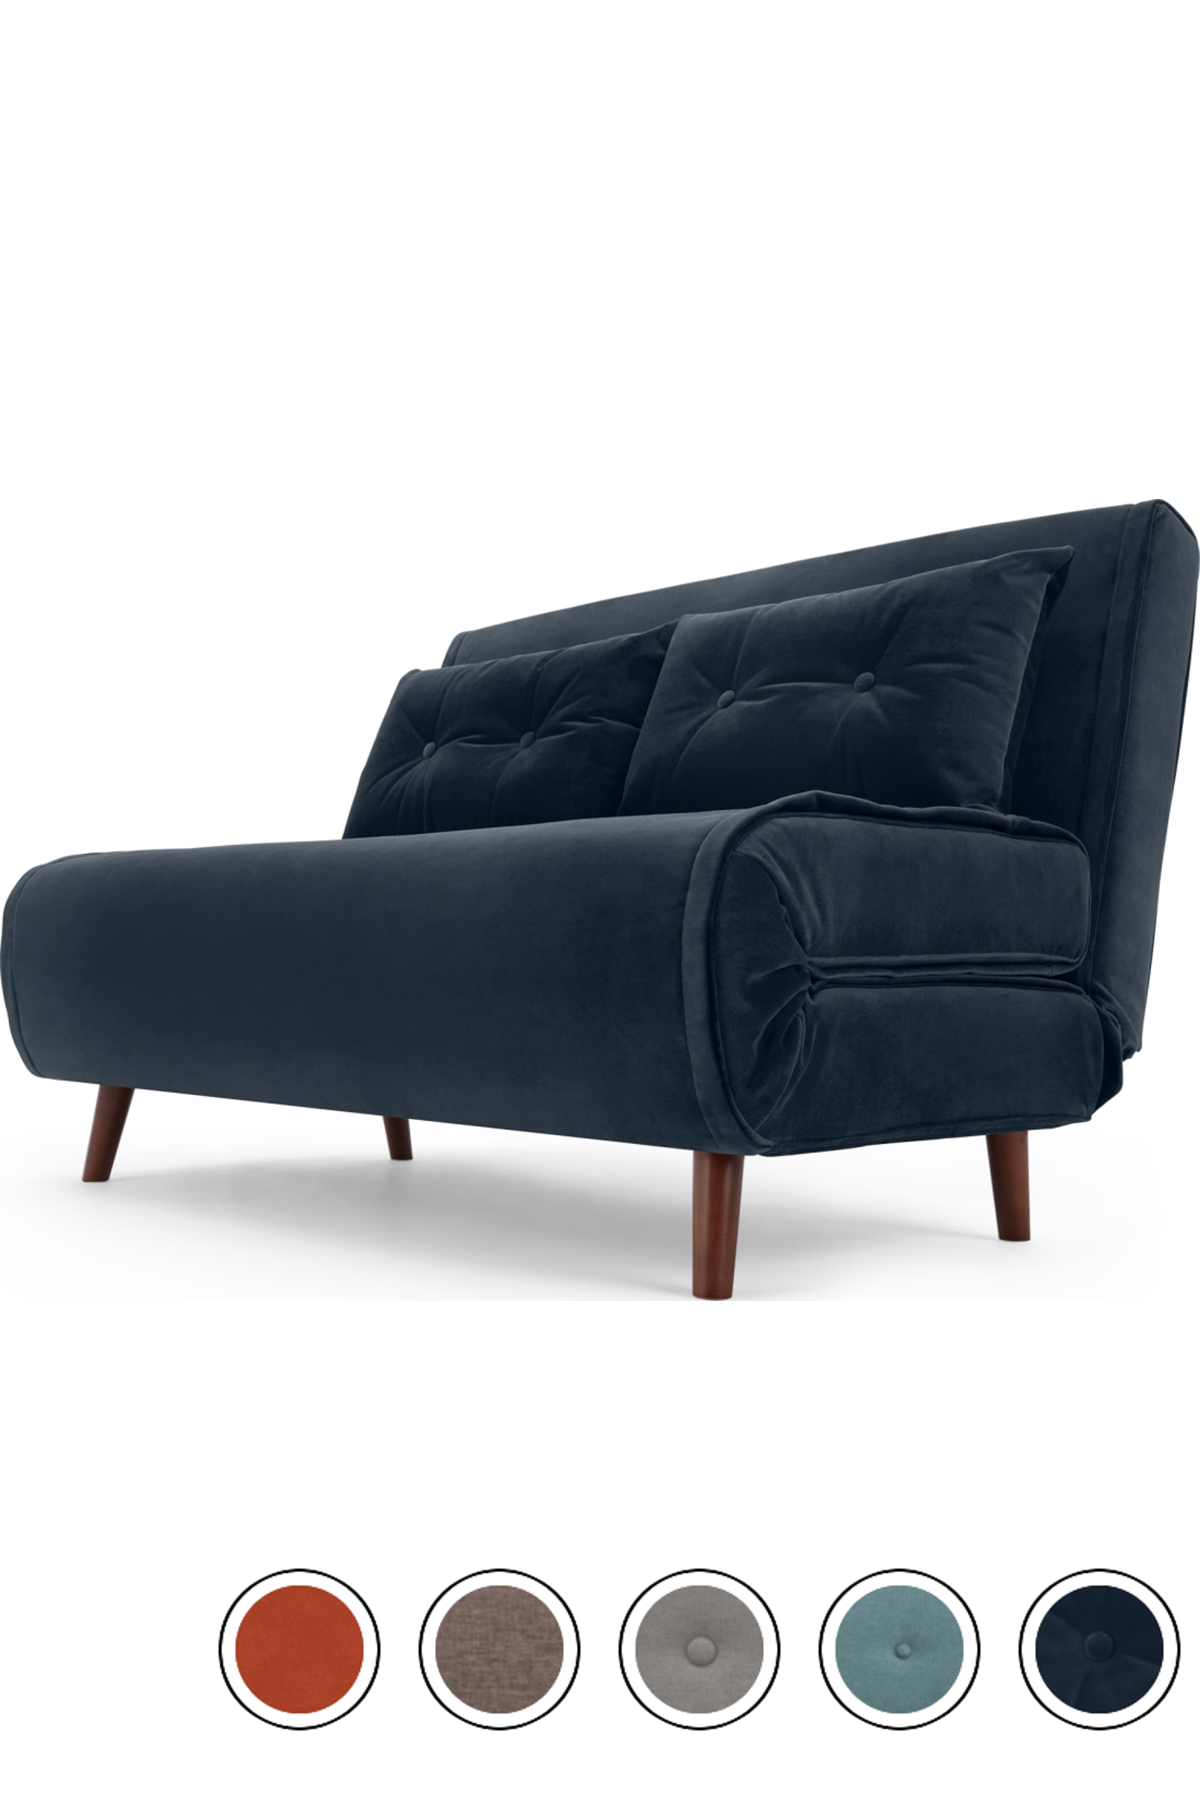 Haru Small Sofa Bed Sapphire Blue Velvet Small Sofa Bed Small Sofa Sofa Bed For Small Spaces